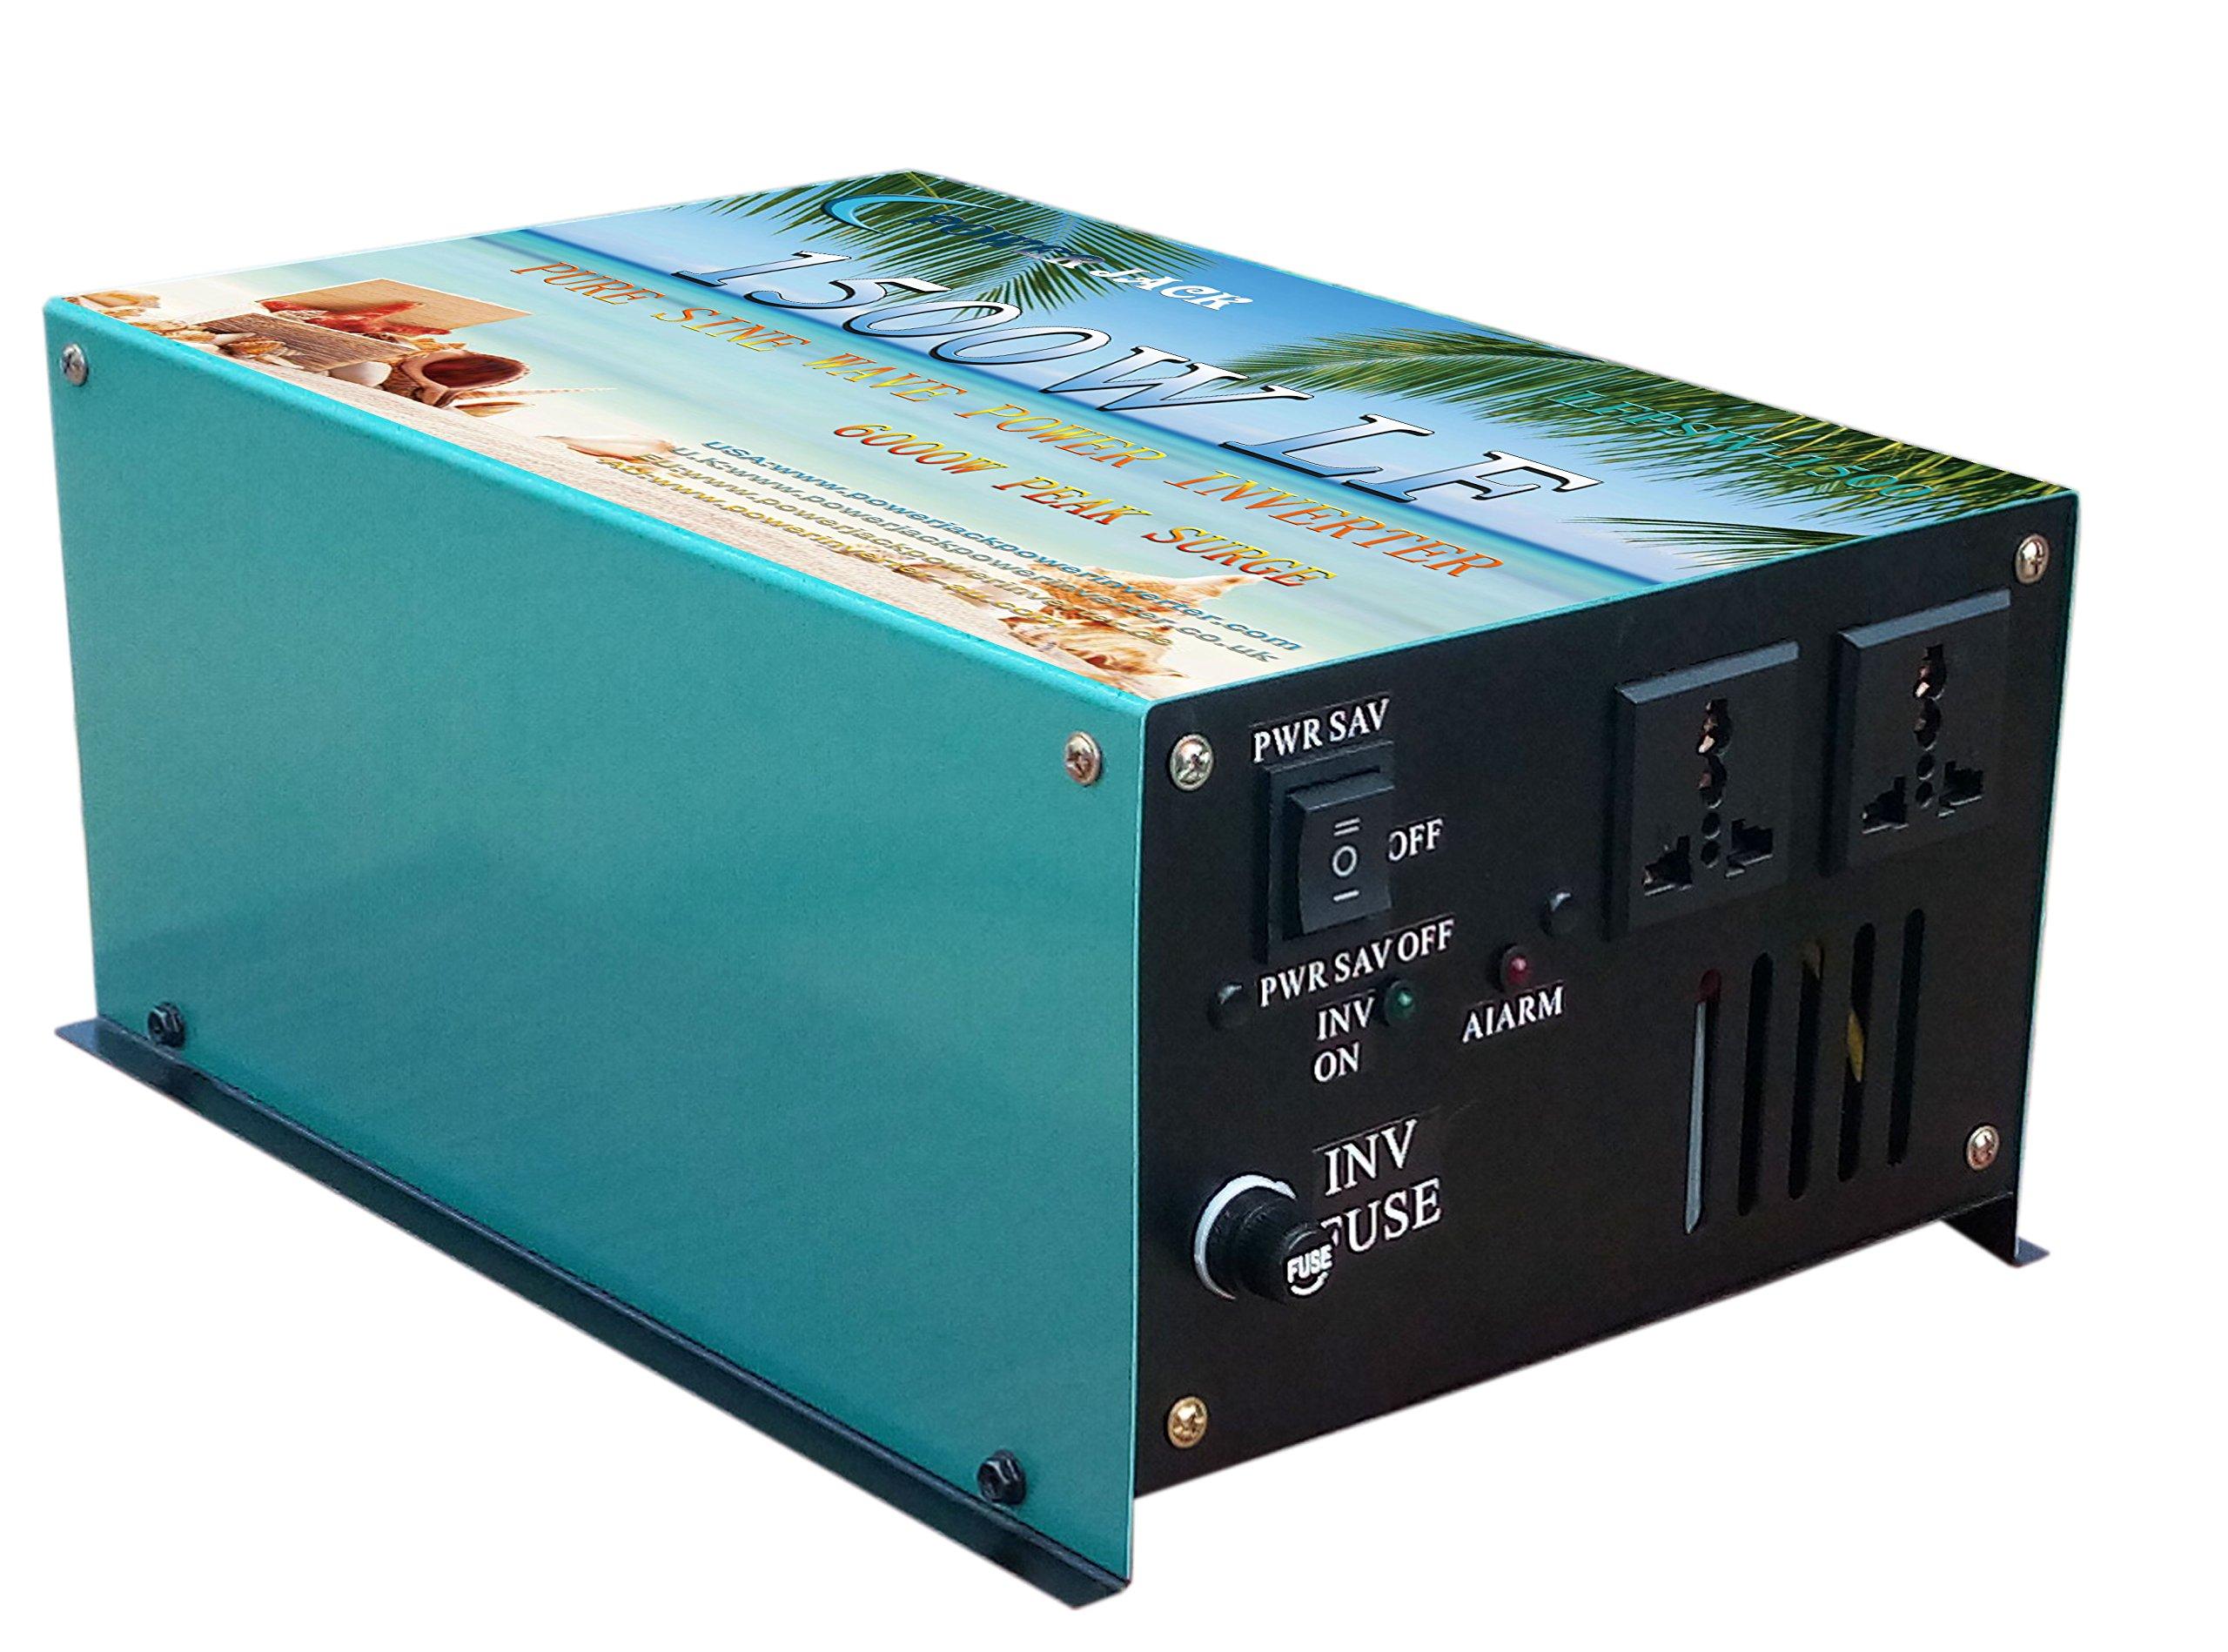 6000W peak 1500W LF Pure Sine Wave Power Inverter DC 12V to AC 110V 60Hz